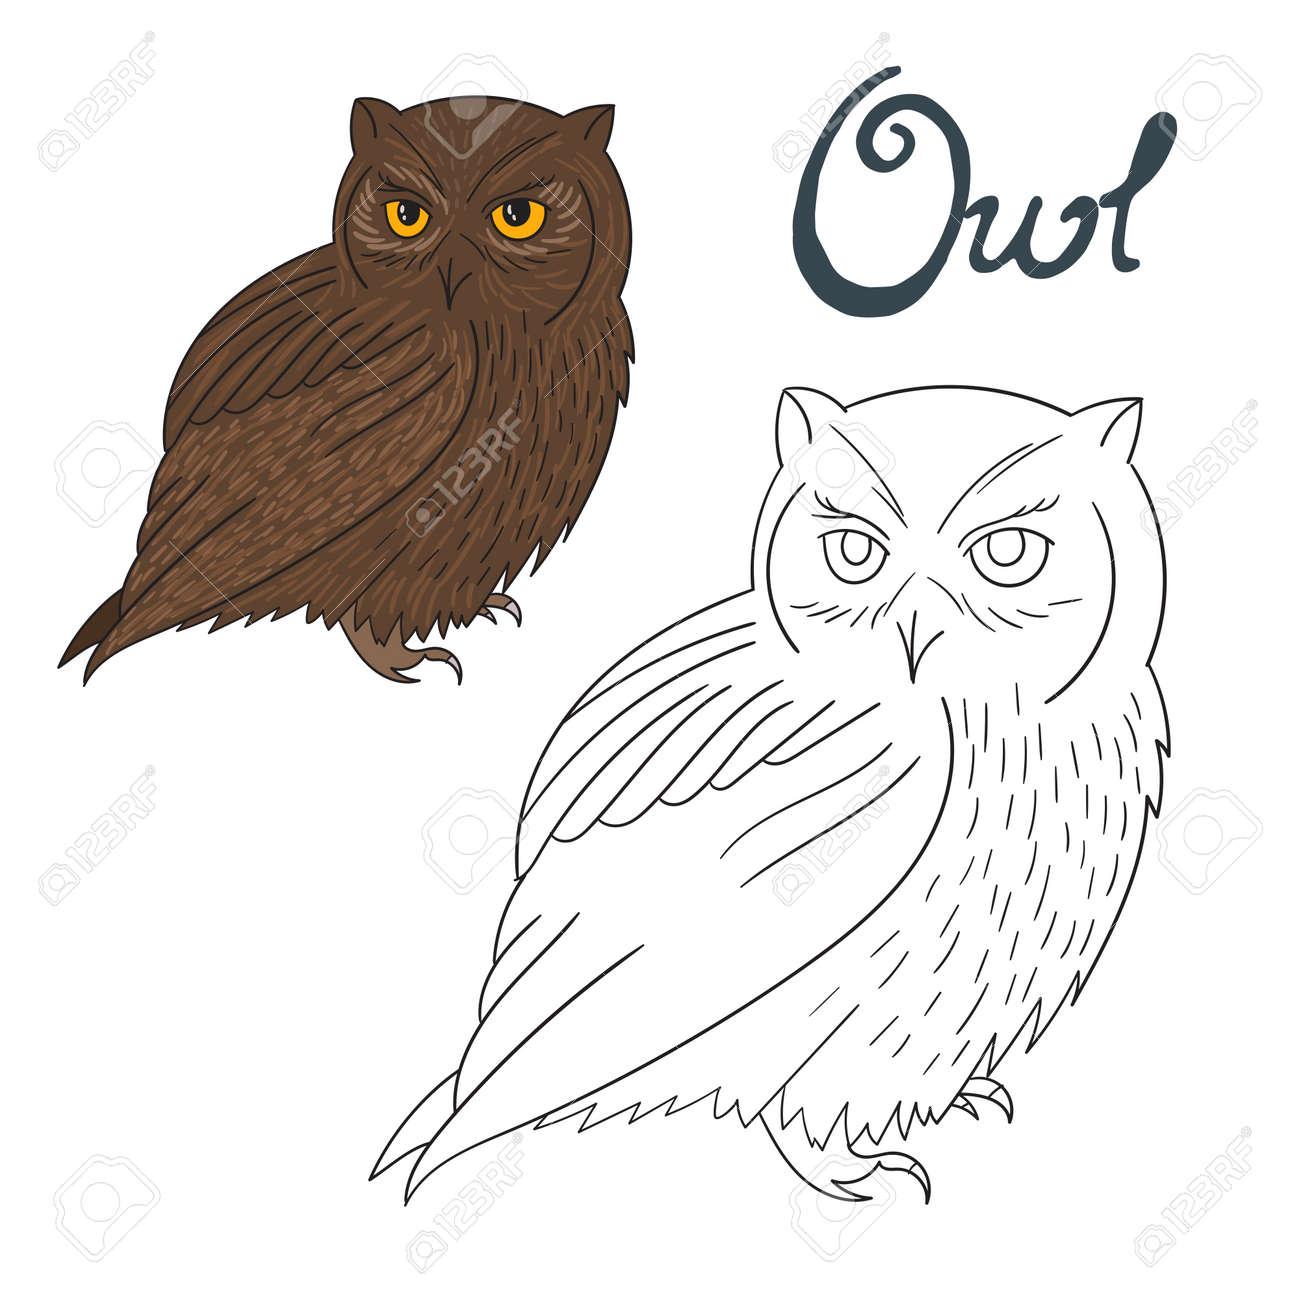 Educational Game Coloring Book Owl Bird Cartoon Doodle Hand Drawn Vector Illustration Stock